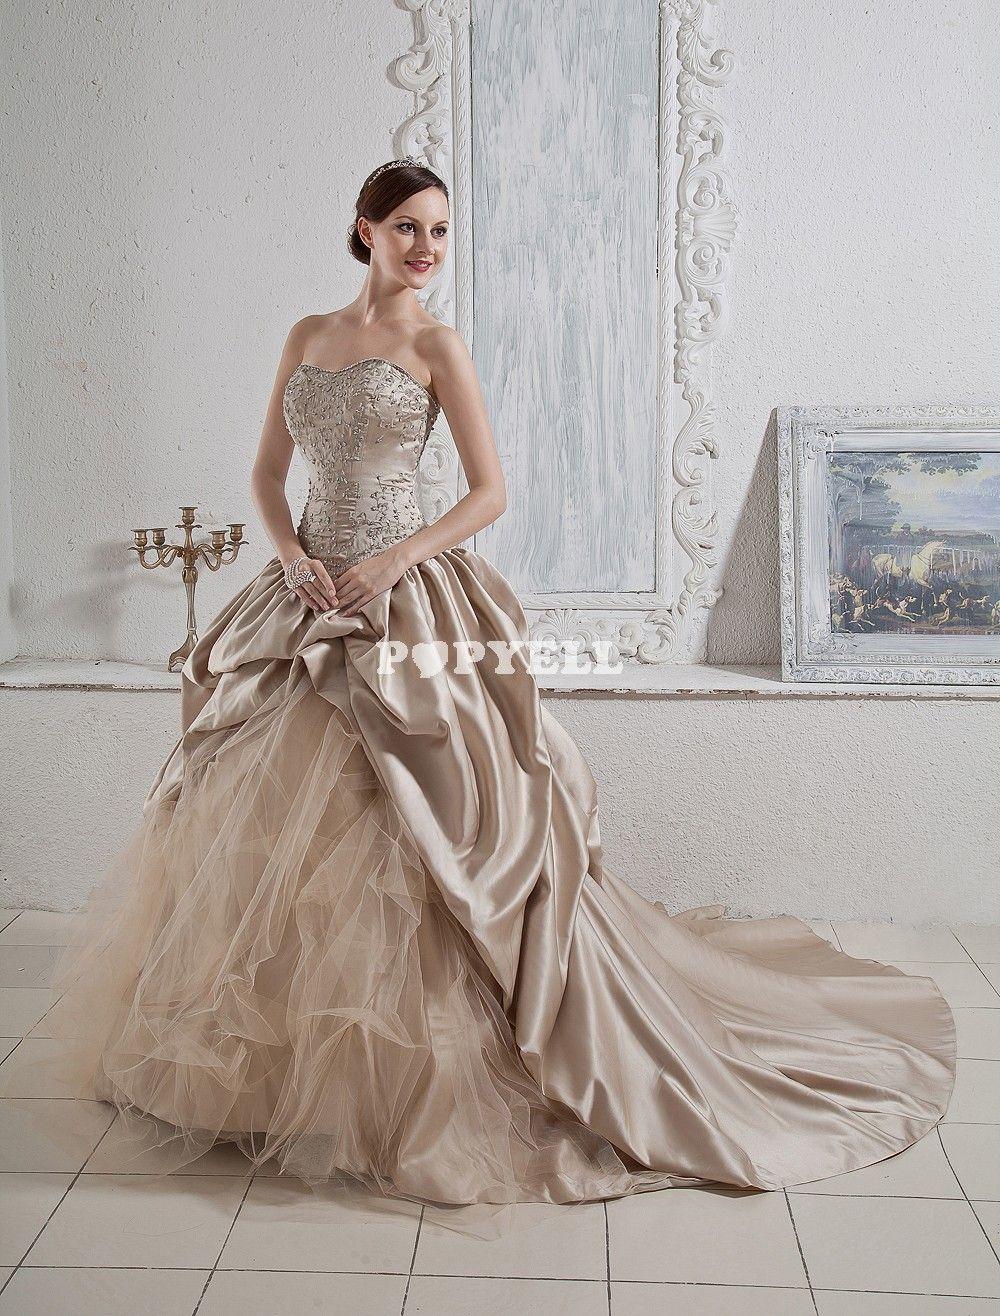 robe de mariee courte couleur champagne robes modernes. Black Bedroom Furniture Sets. Home Design Ideas